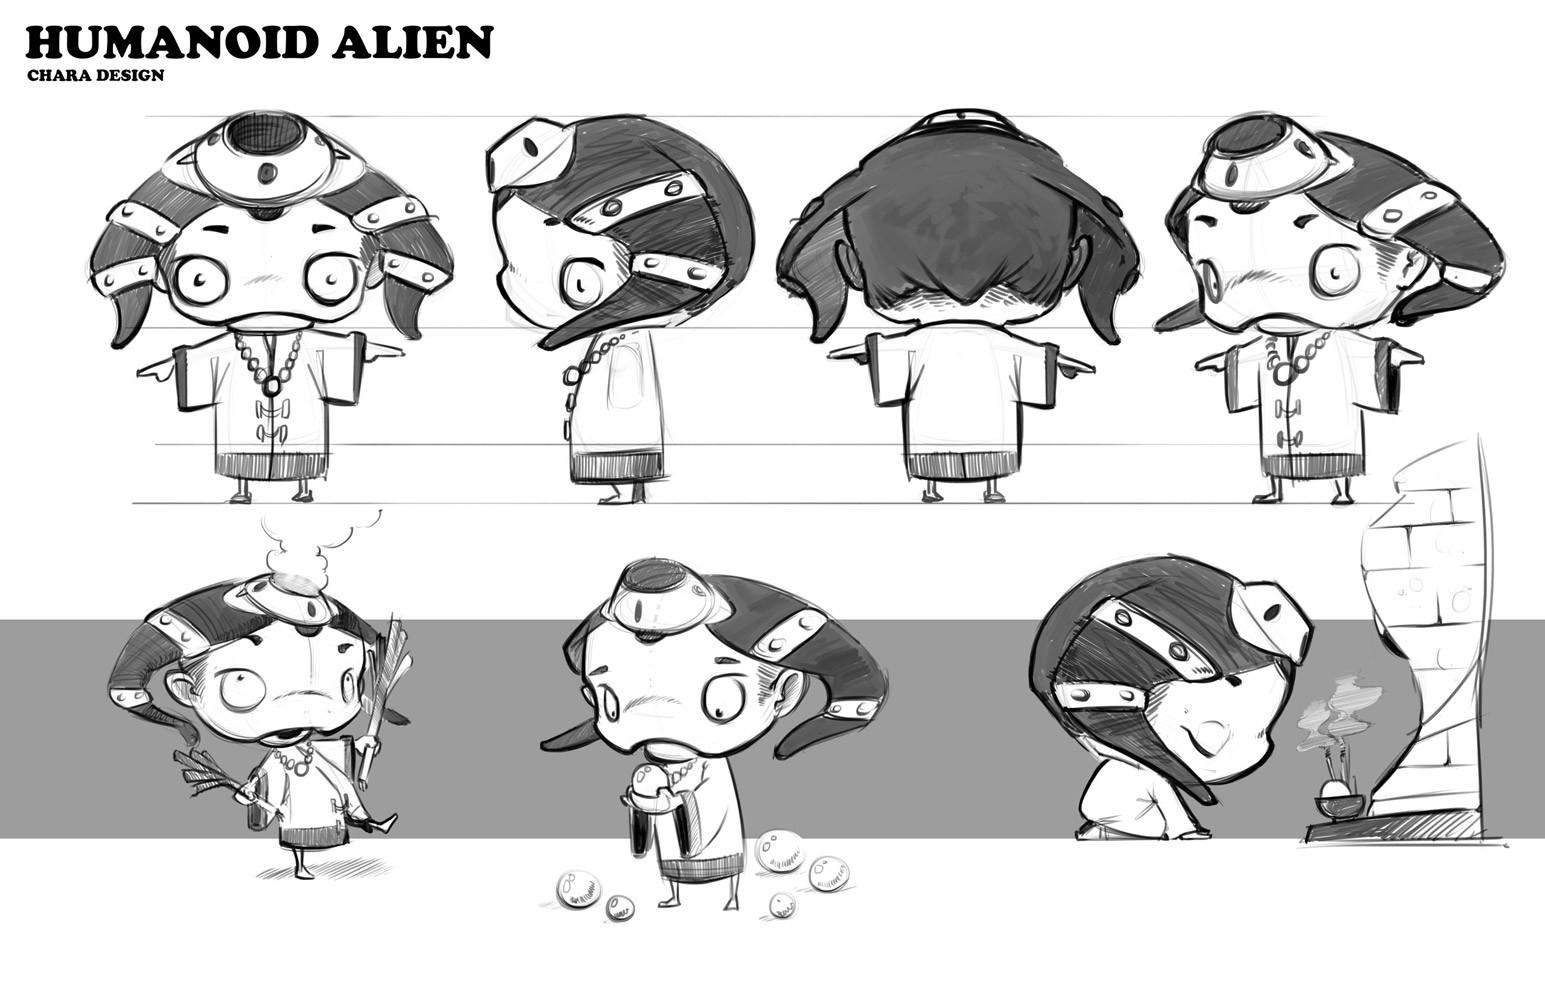 the humanoïd alien